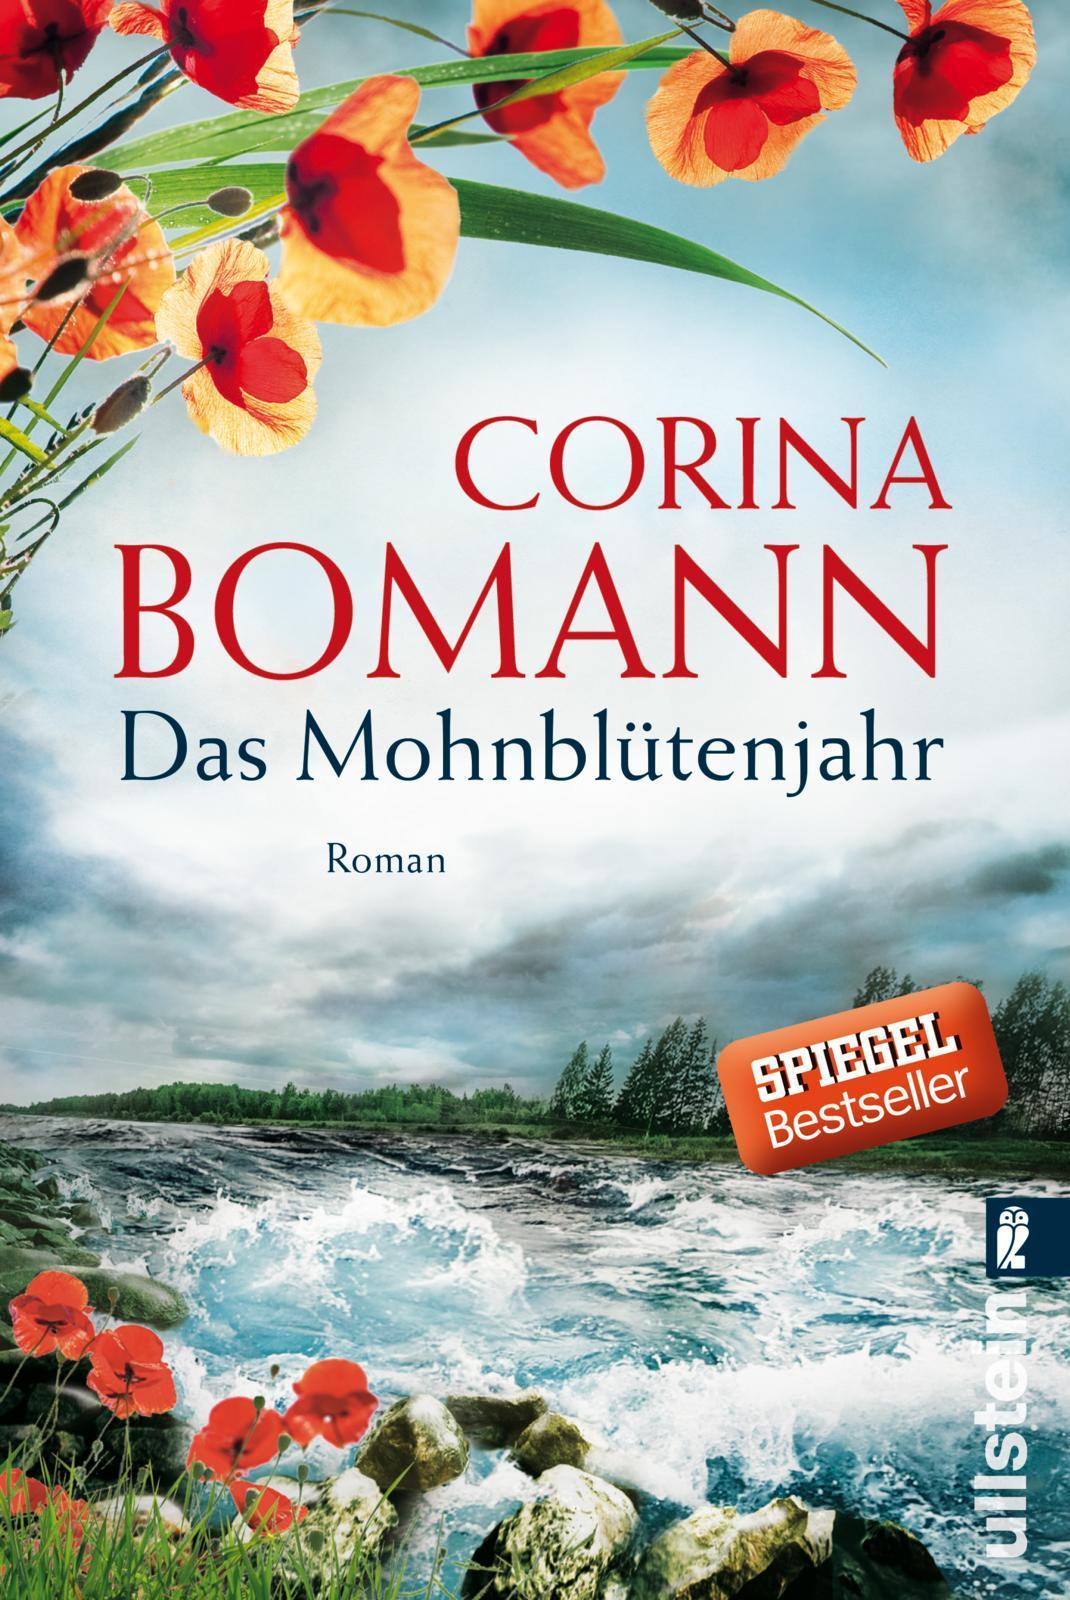 Das Mohnblütenjahr Corina Bomann 9783548286679